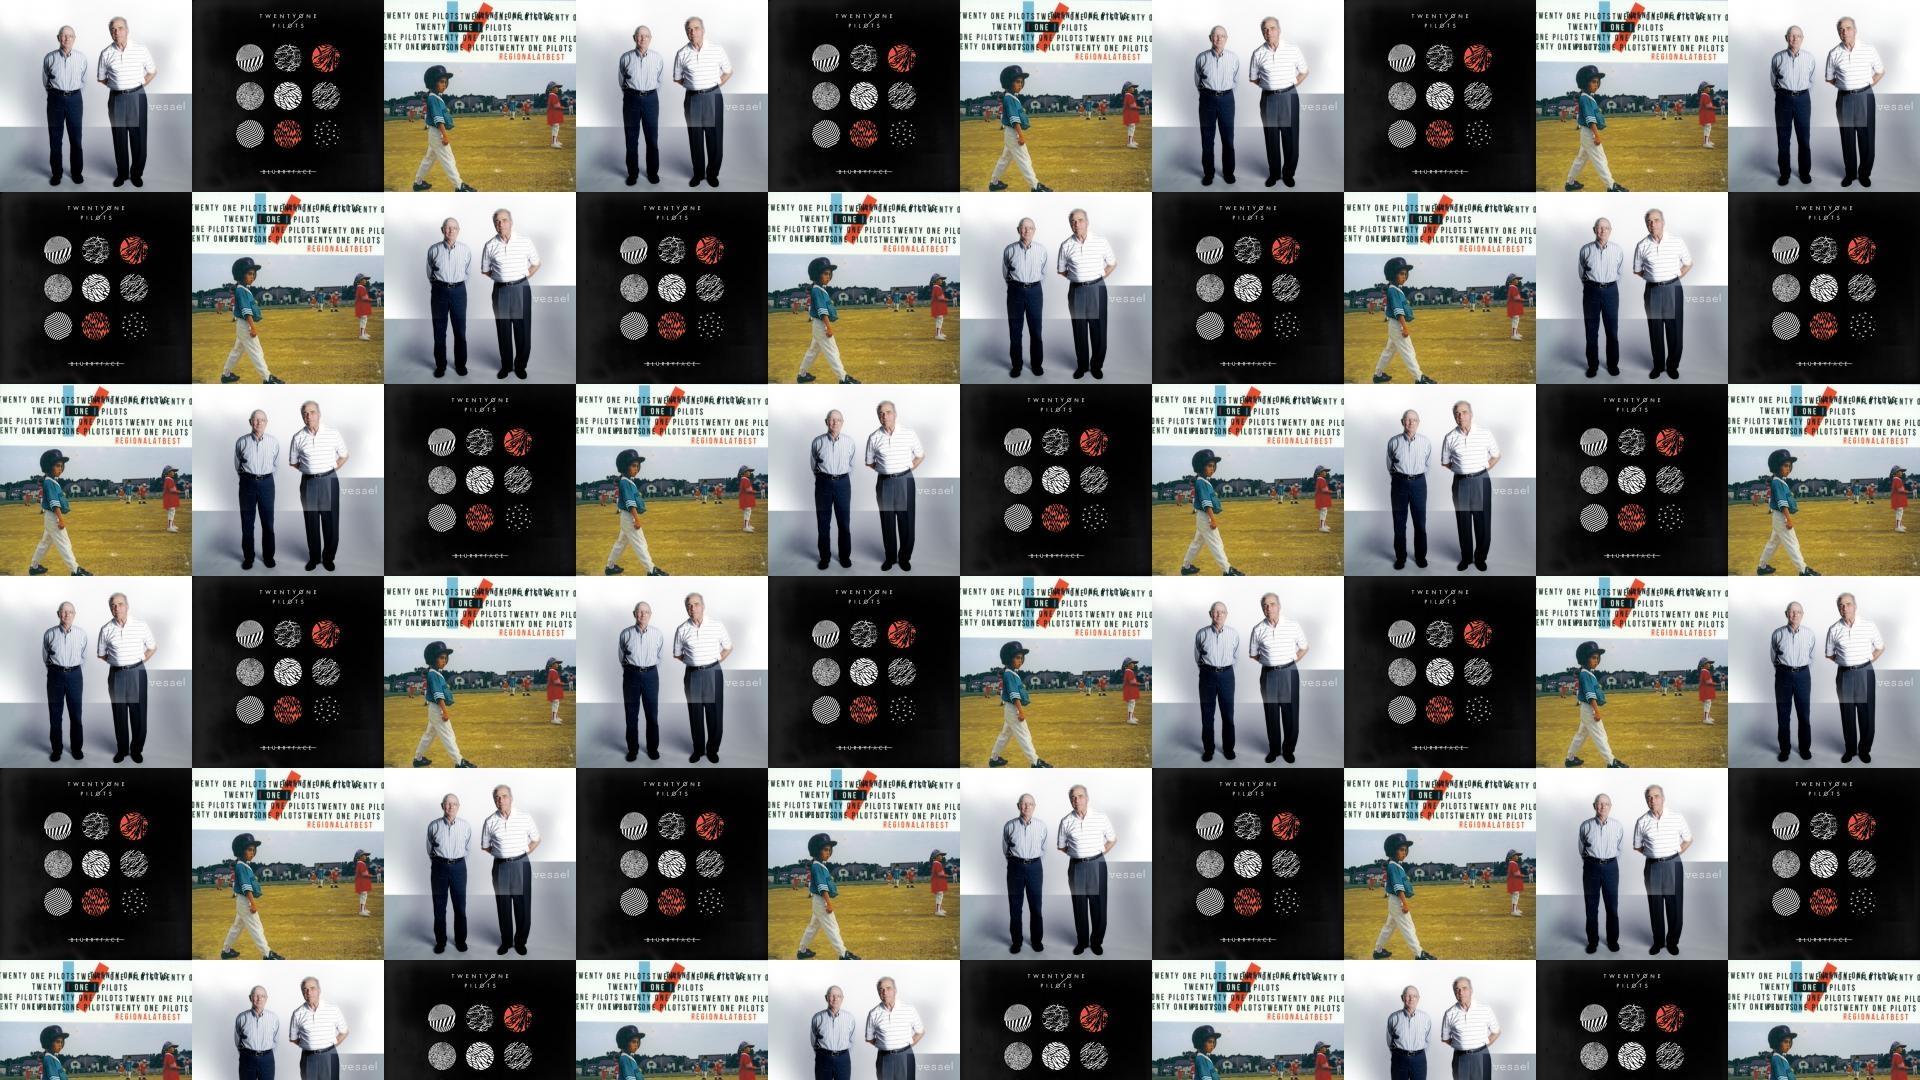 Fall Out Boy Wallpaper Pc Twenty One Pilots Wallpaper 183 ① Download Free Full Hd